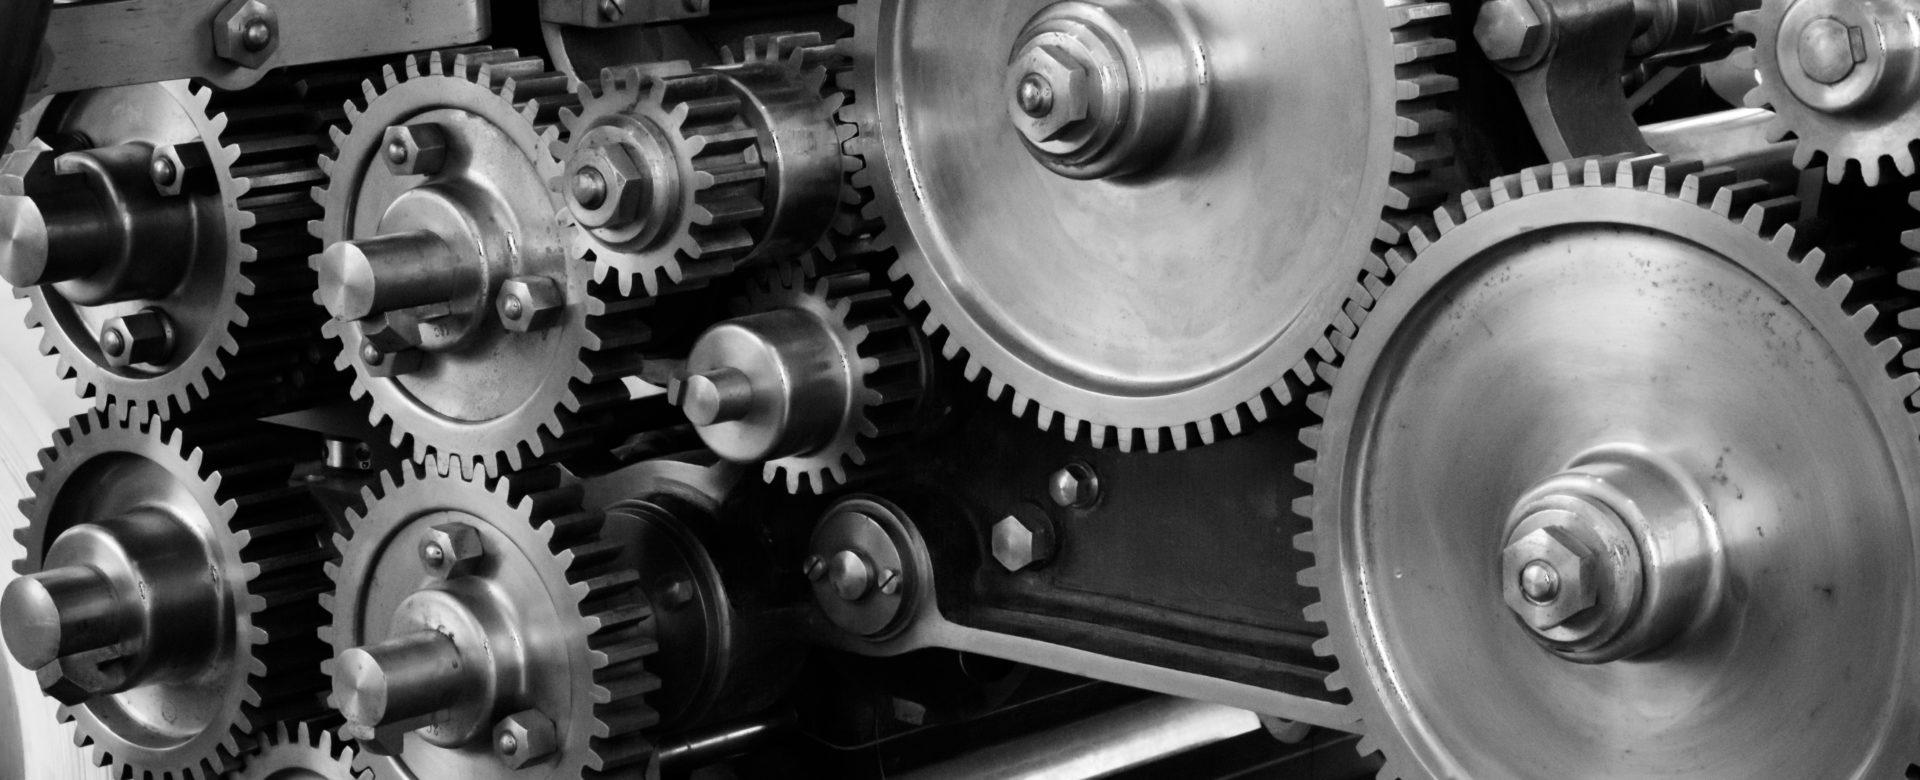 Производство металлоизделий на токарном ЧПУ станке